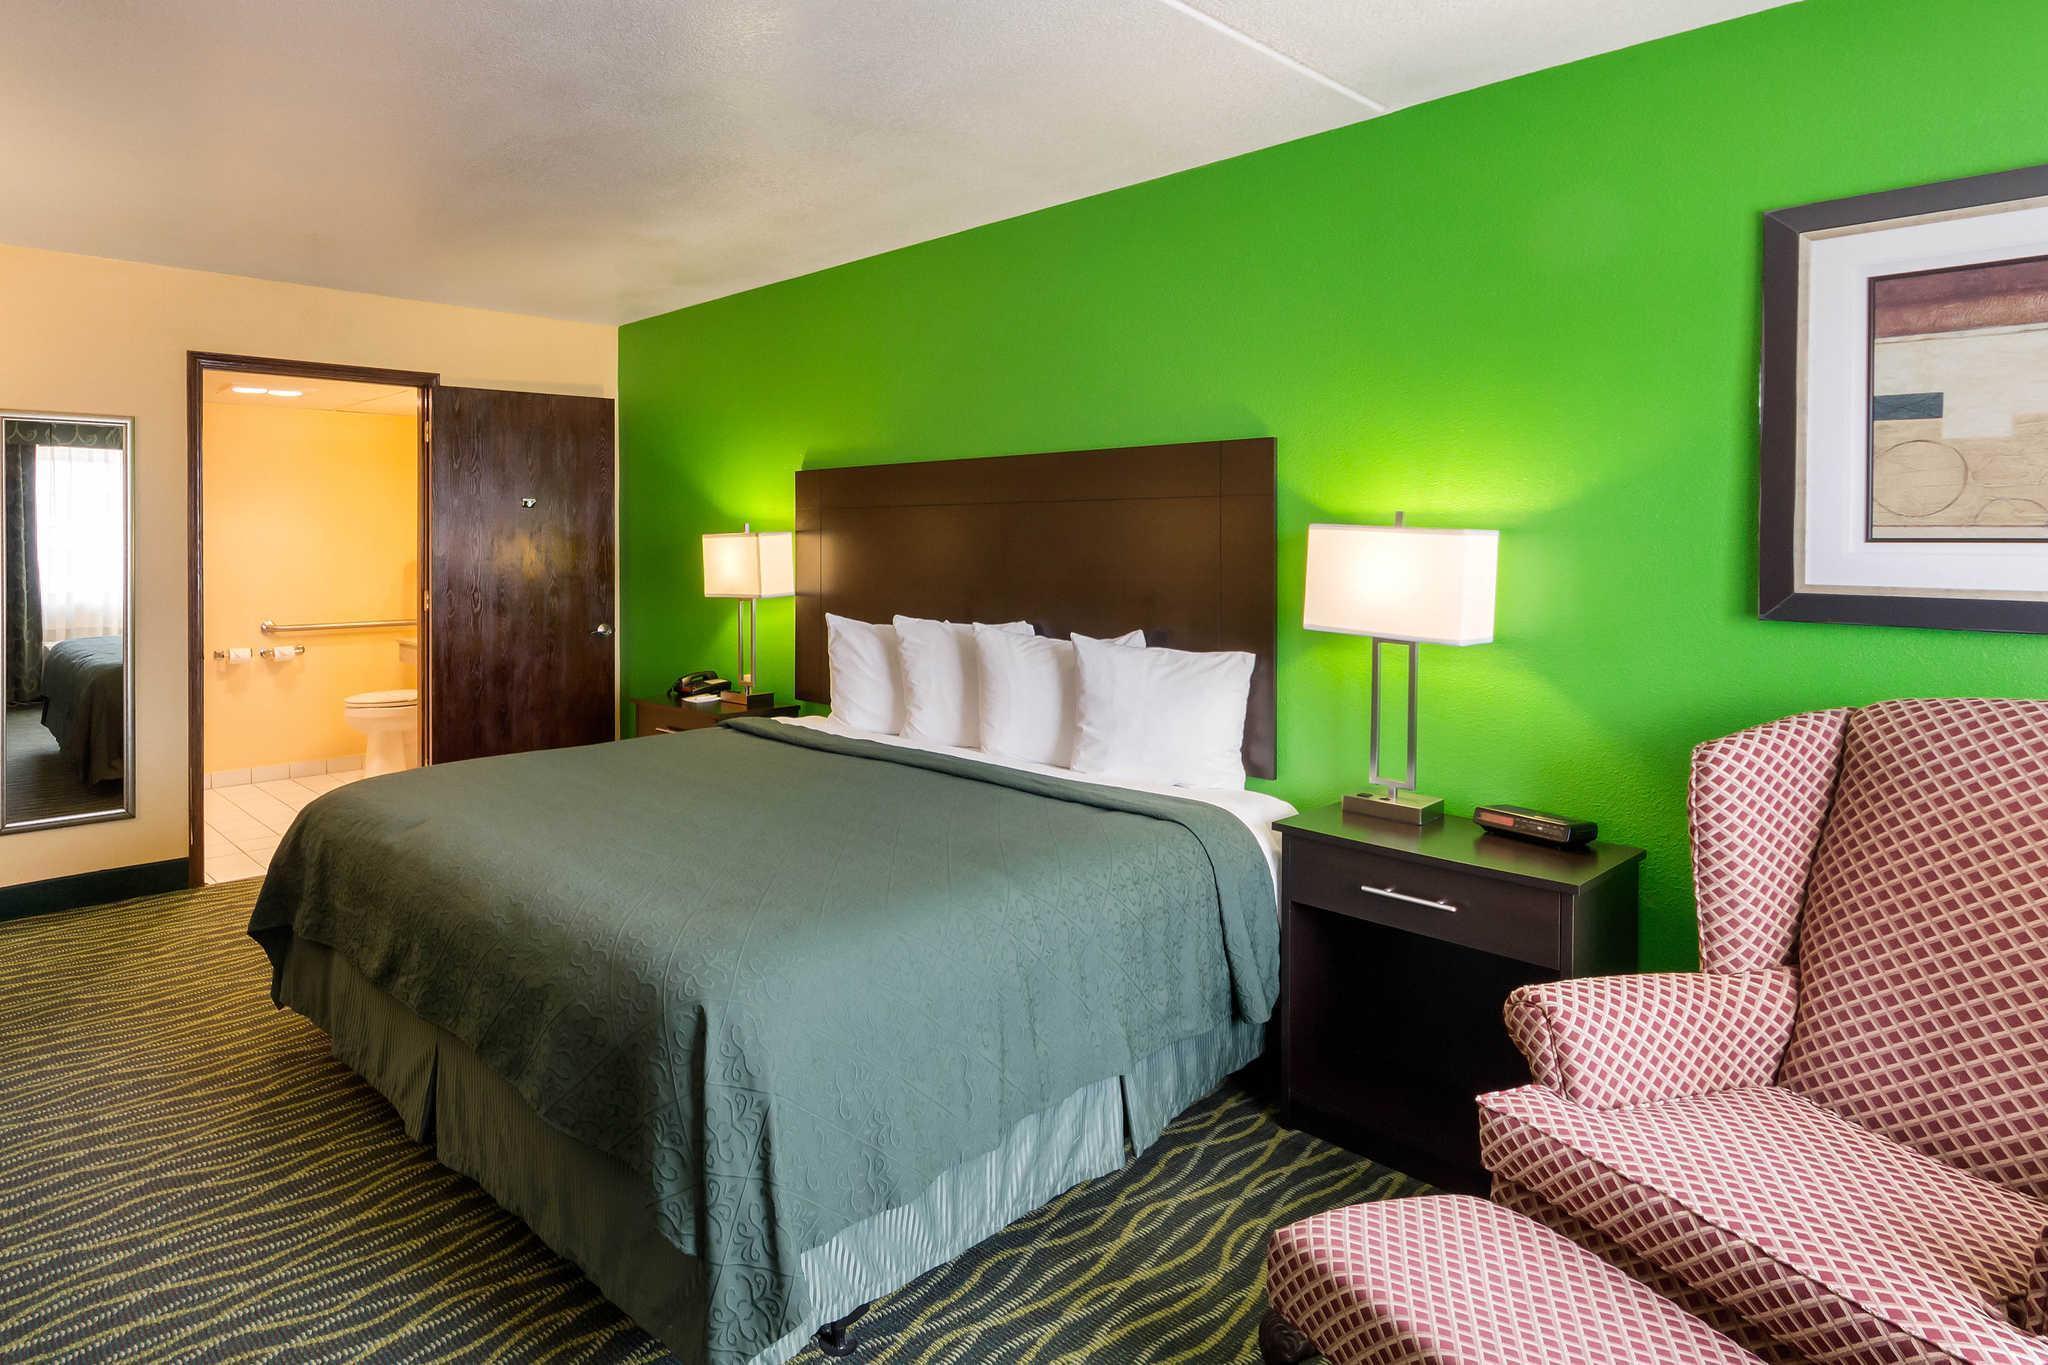 Quality Inn Reviews